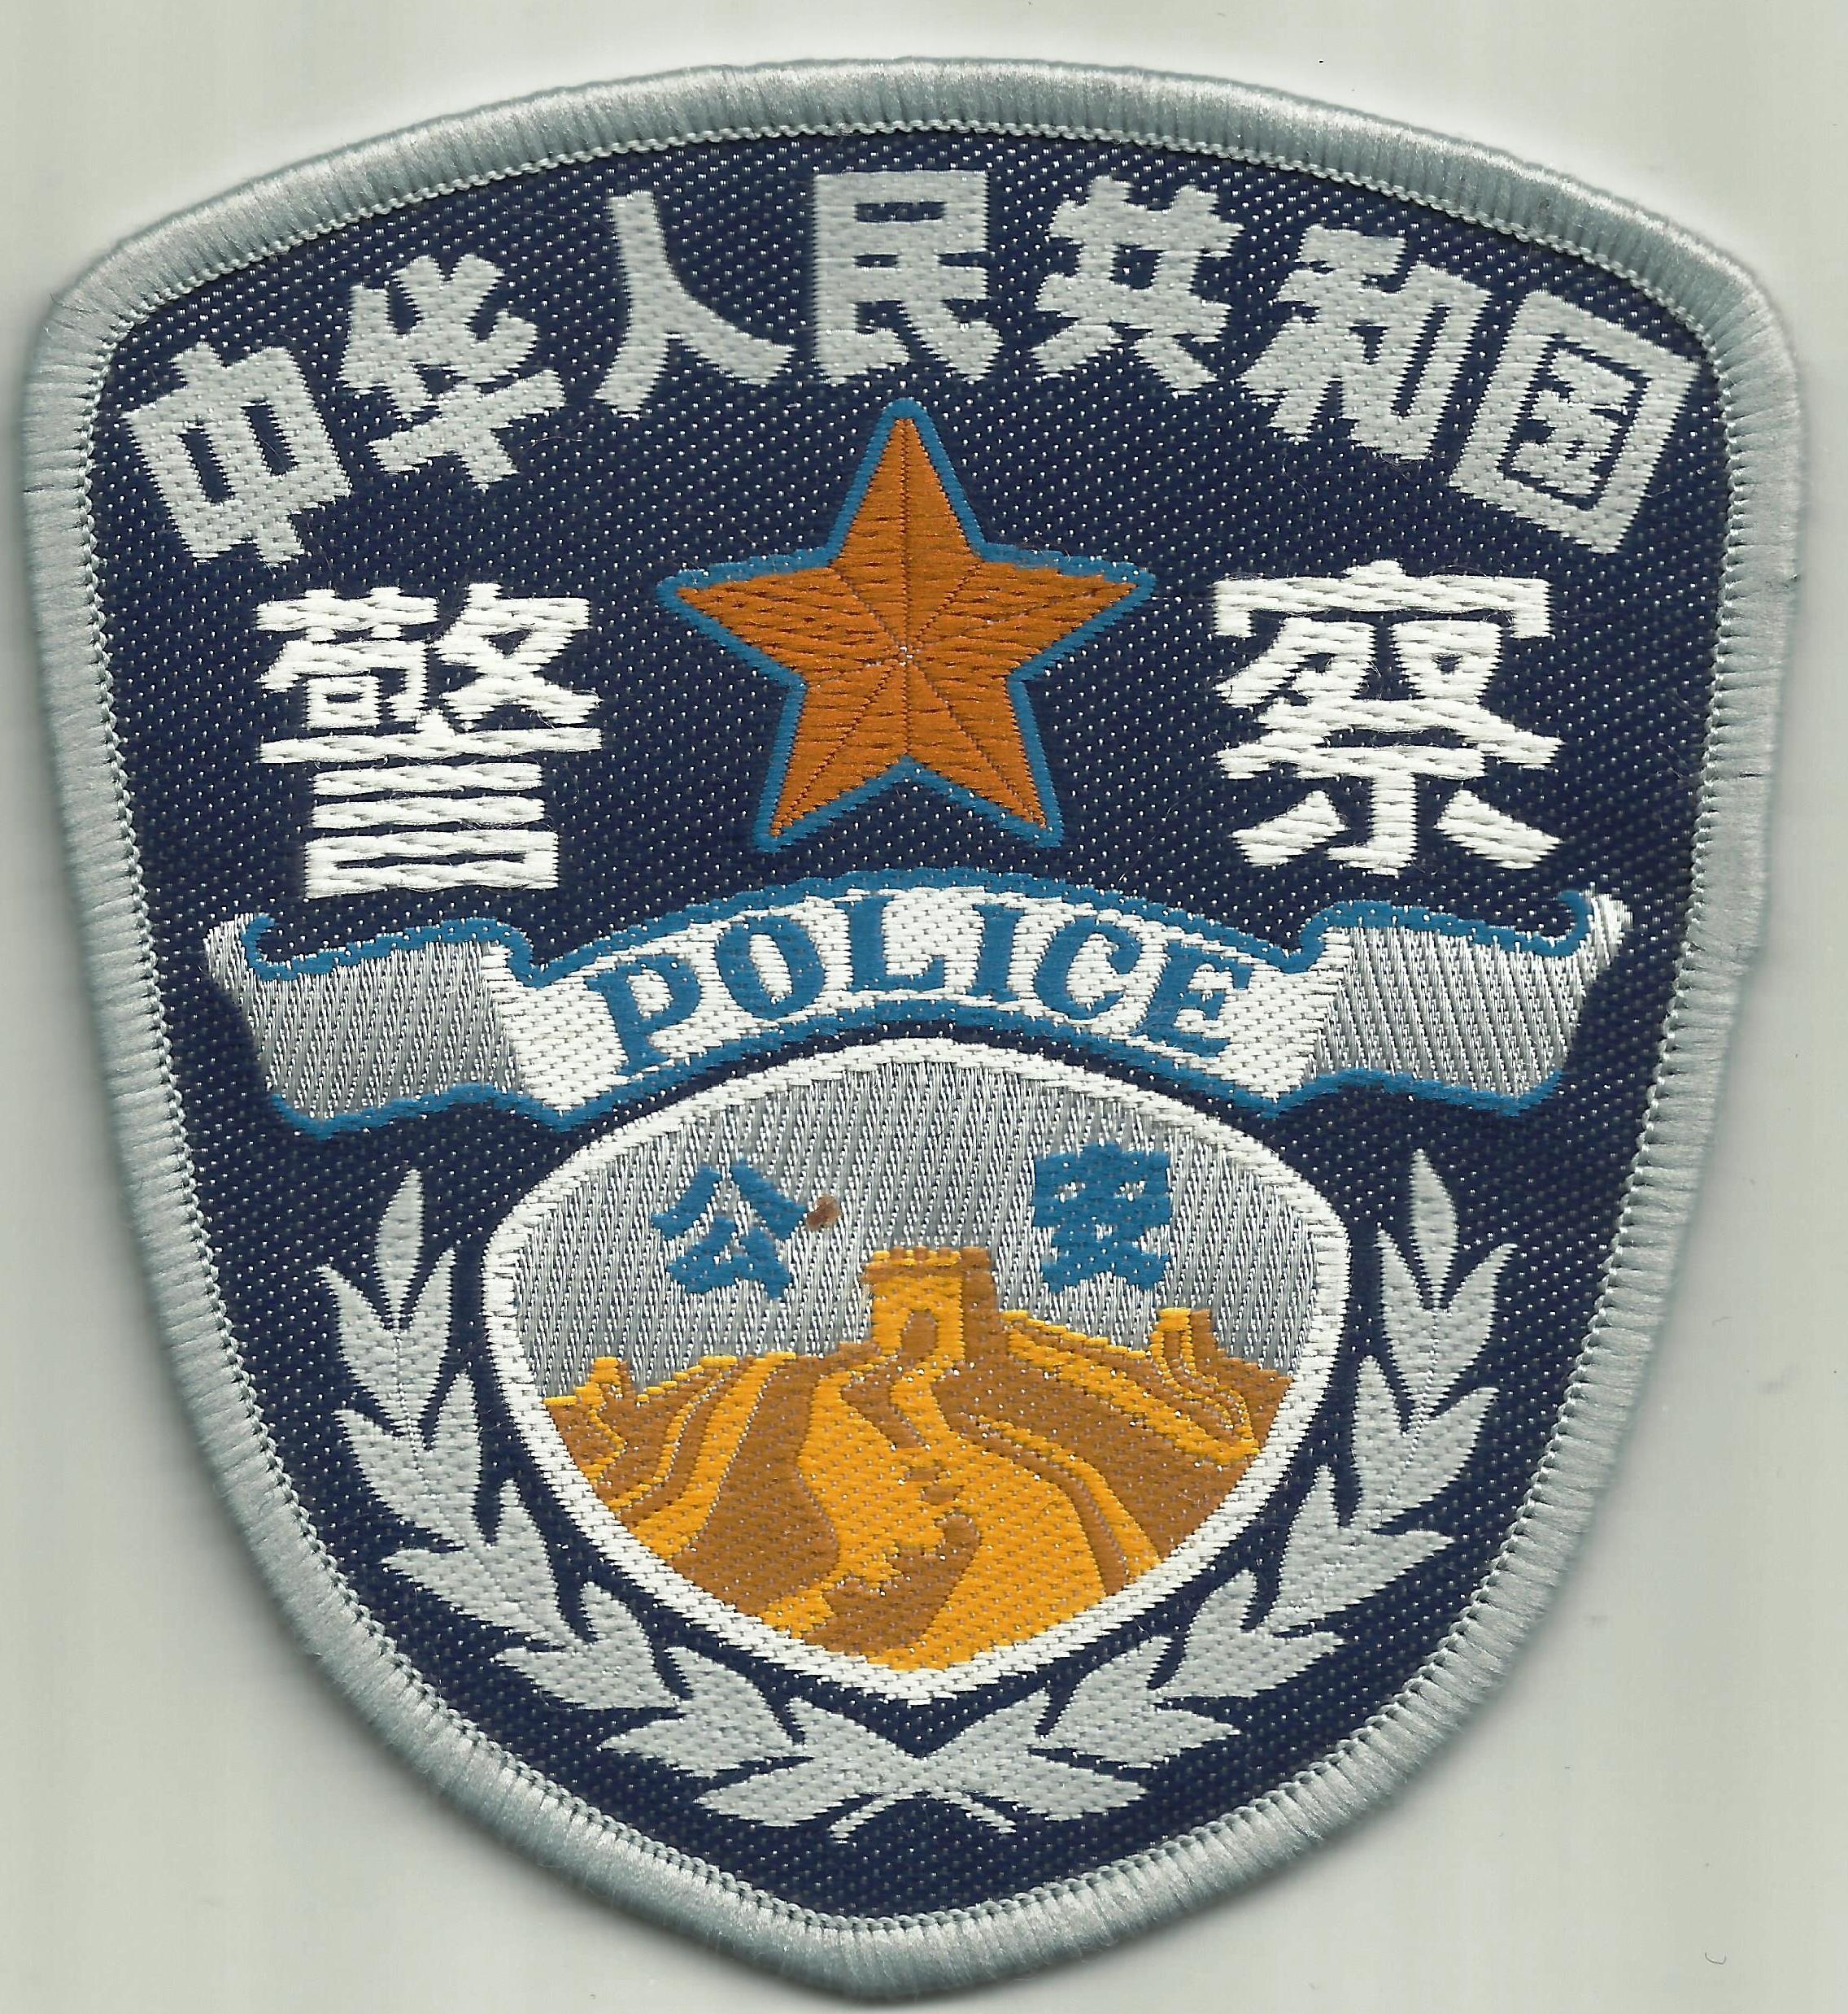 China Police: File:China Police Patch 02.jpg